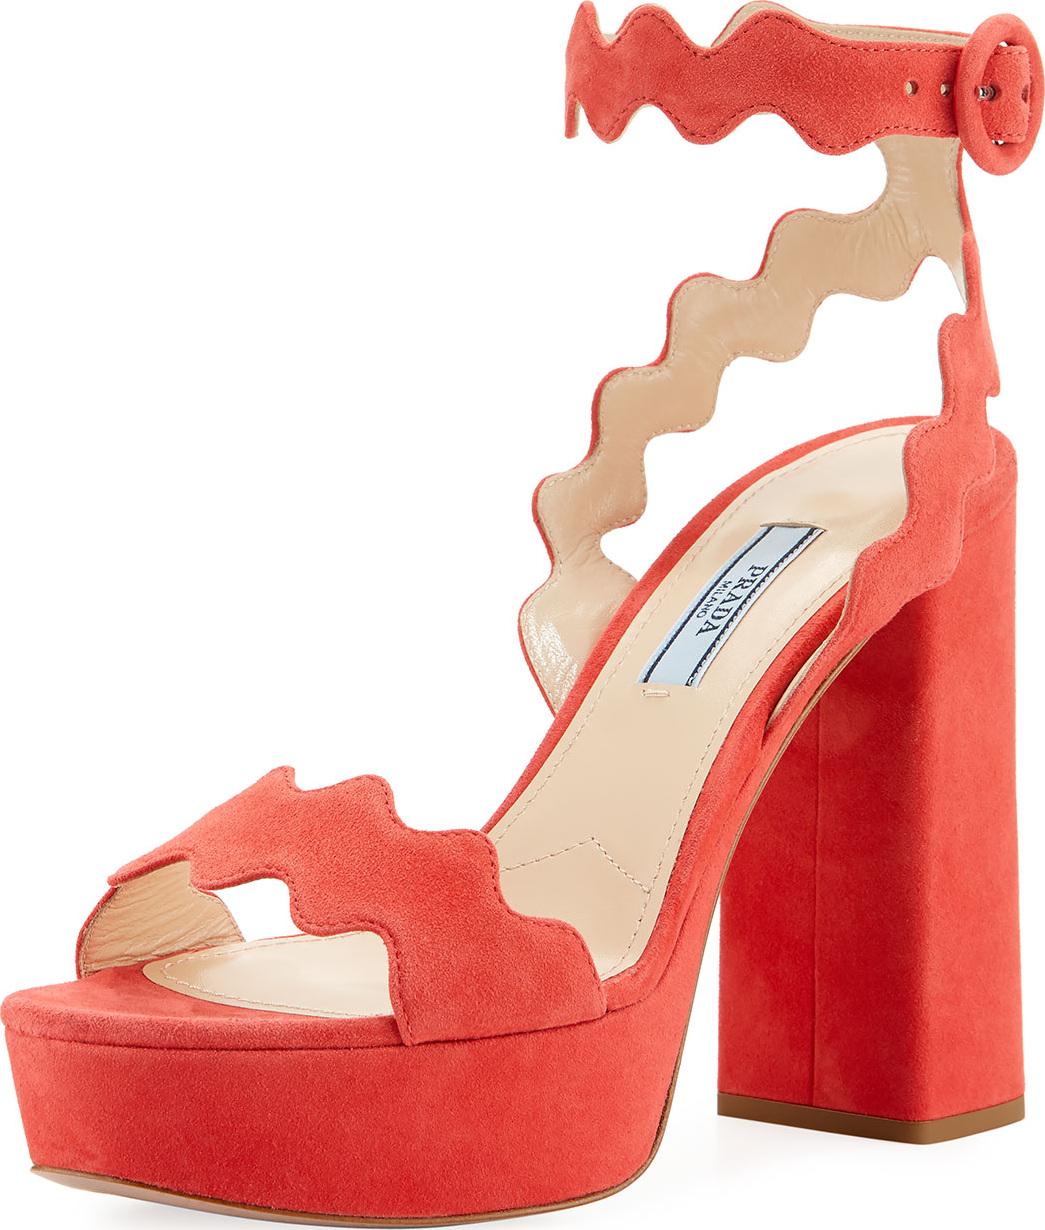 Prada - Scalloped Suede Platform Sandal